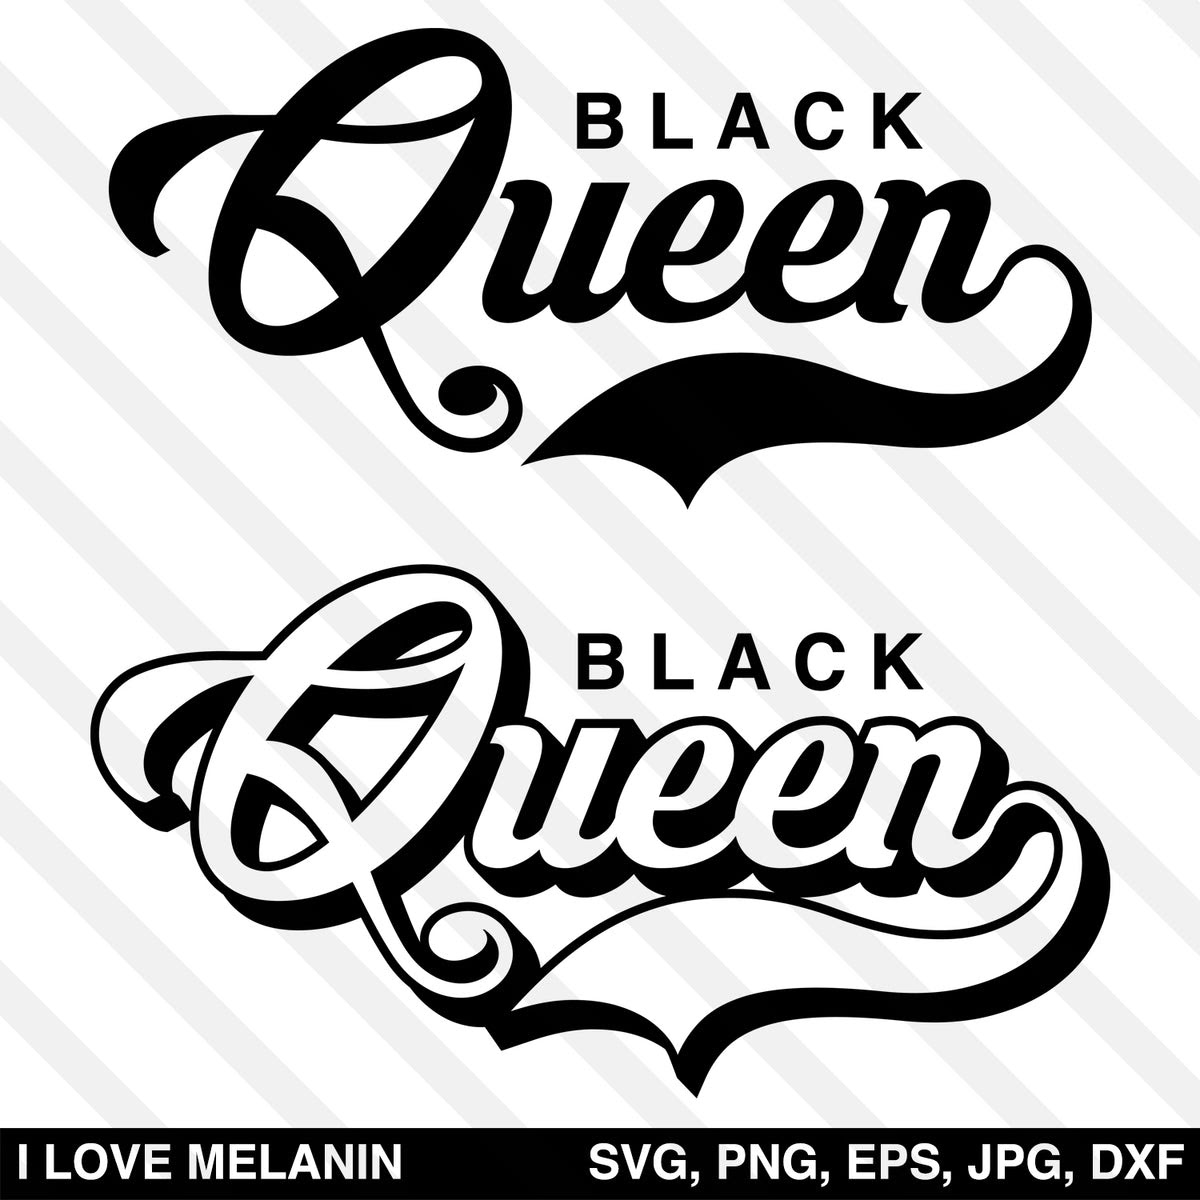 Download Black Queen SVG - I Love Melanin